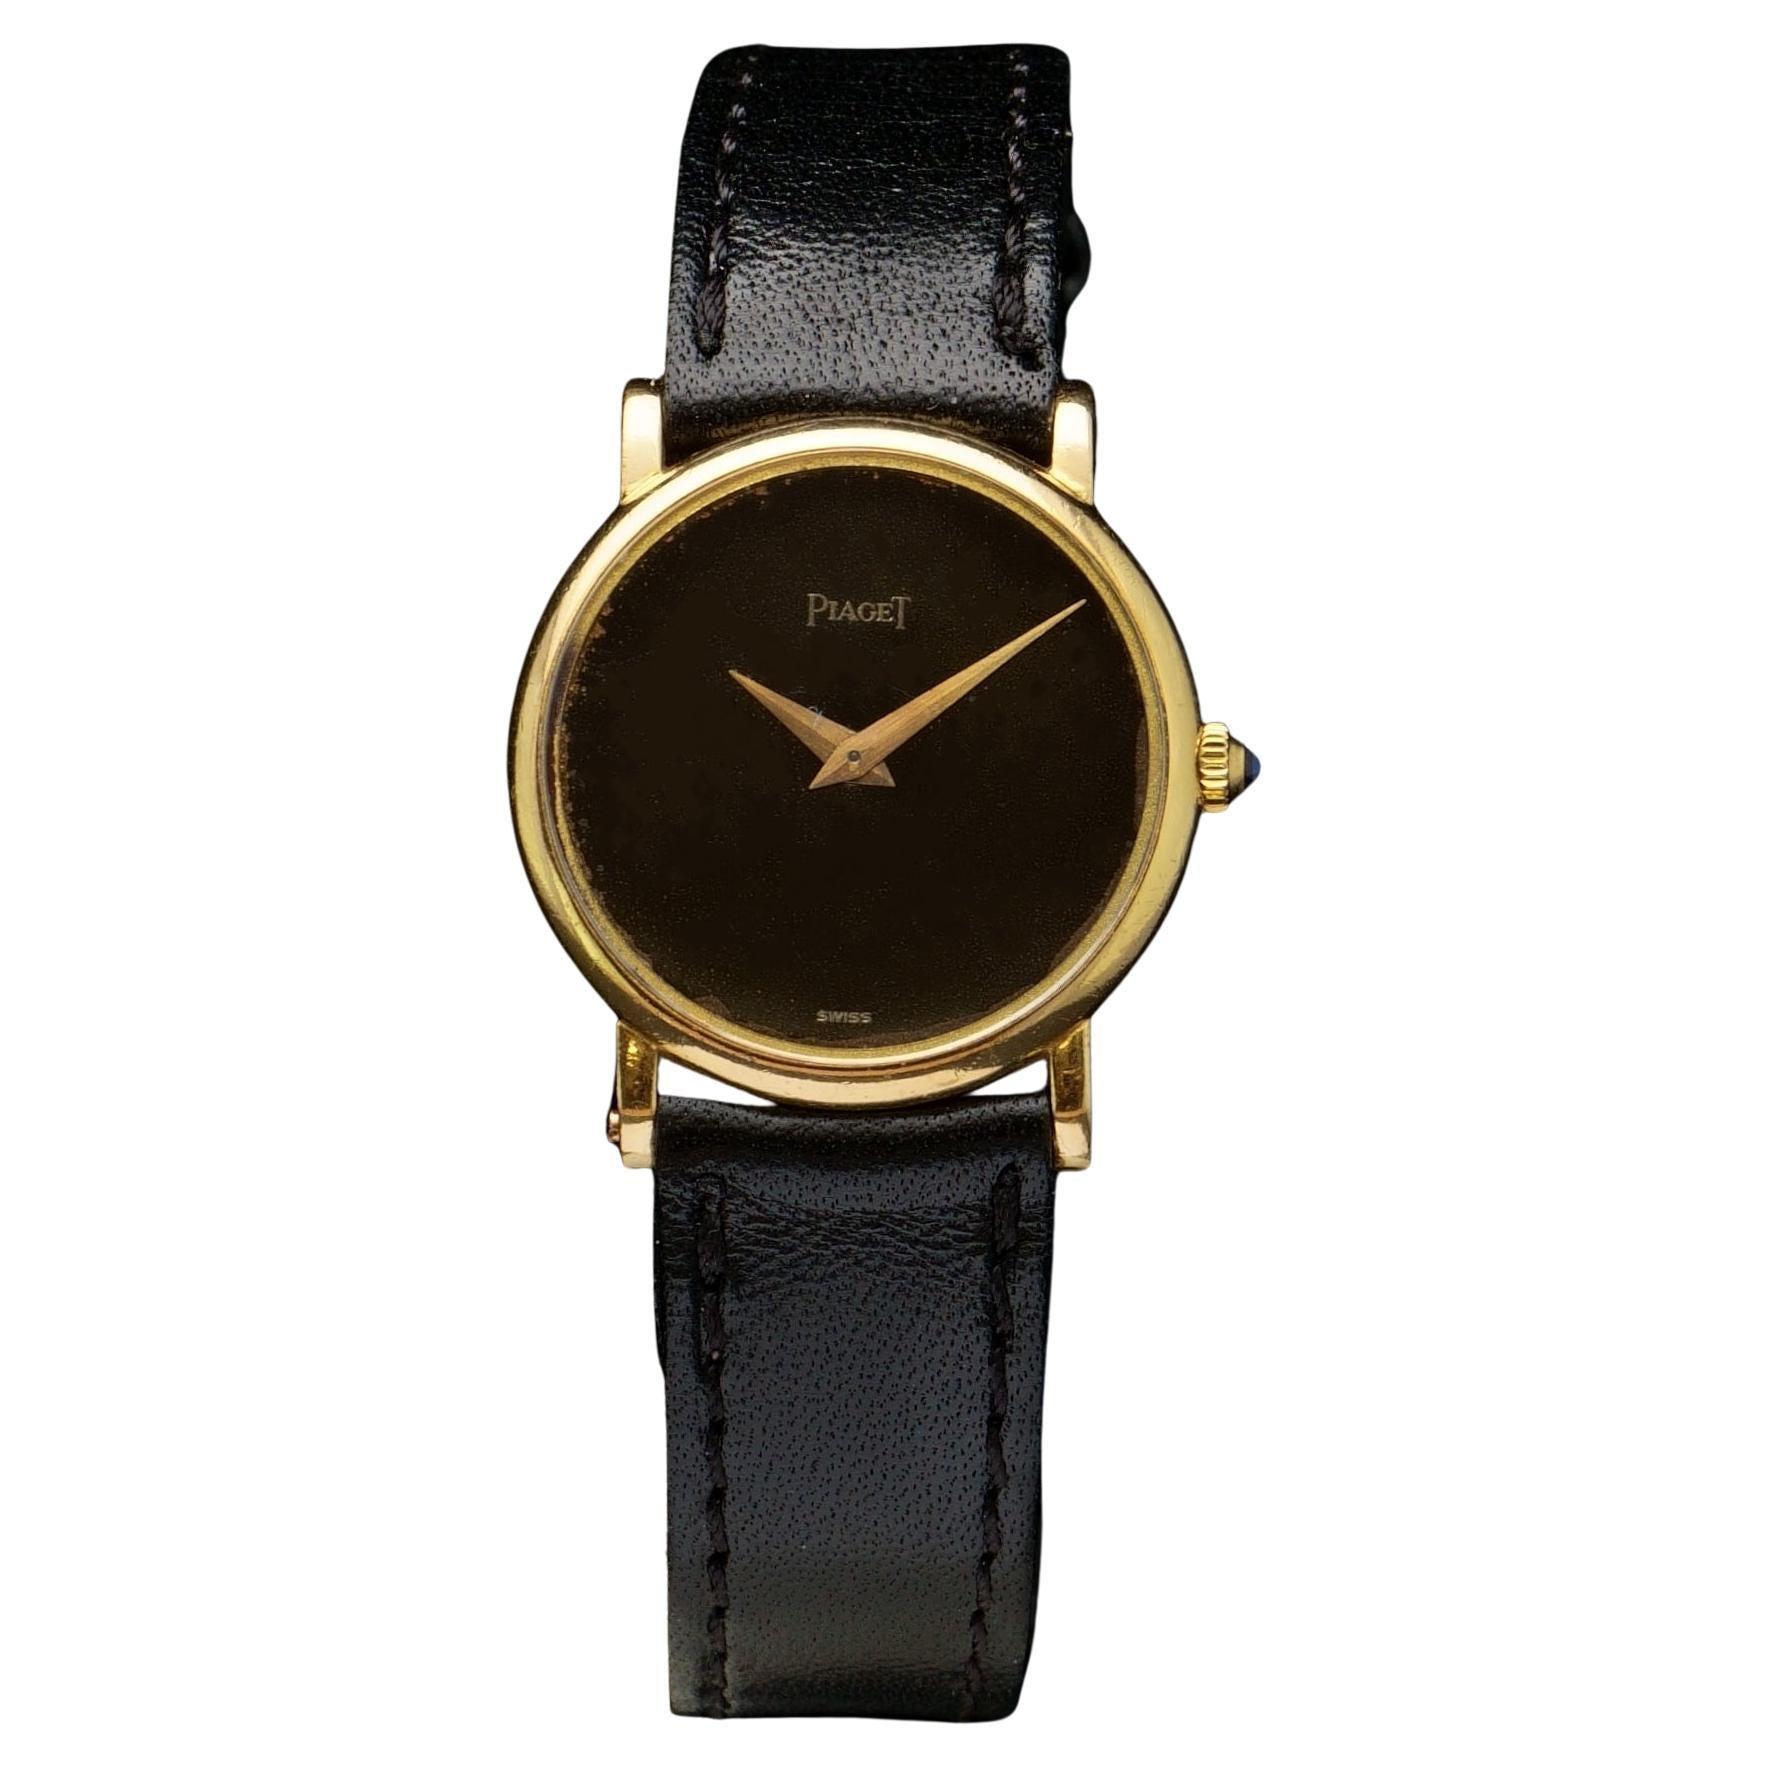 Piaget Classic 18kt Gold Manual Winding Wristwatch